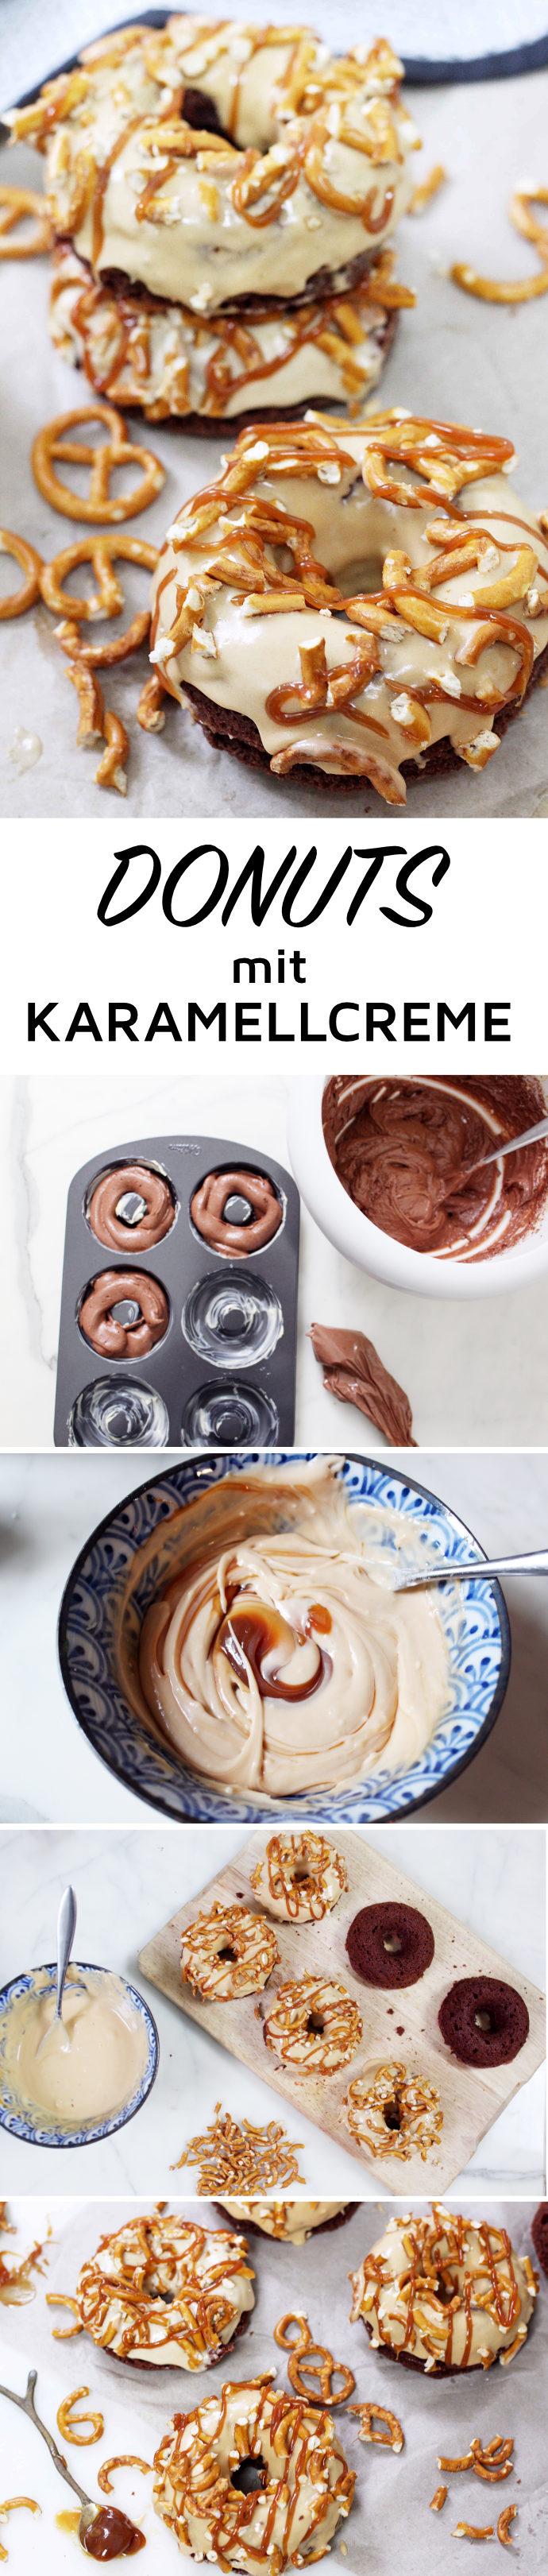 donuts-backen-rezept-karamellcreme-selbermachen-diy-blog